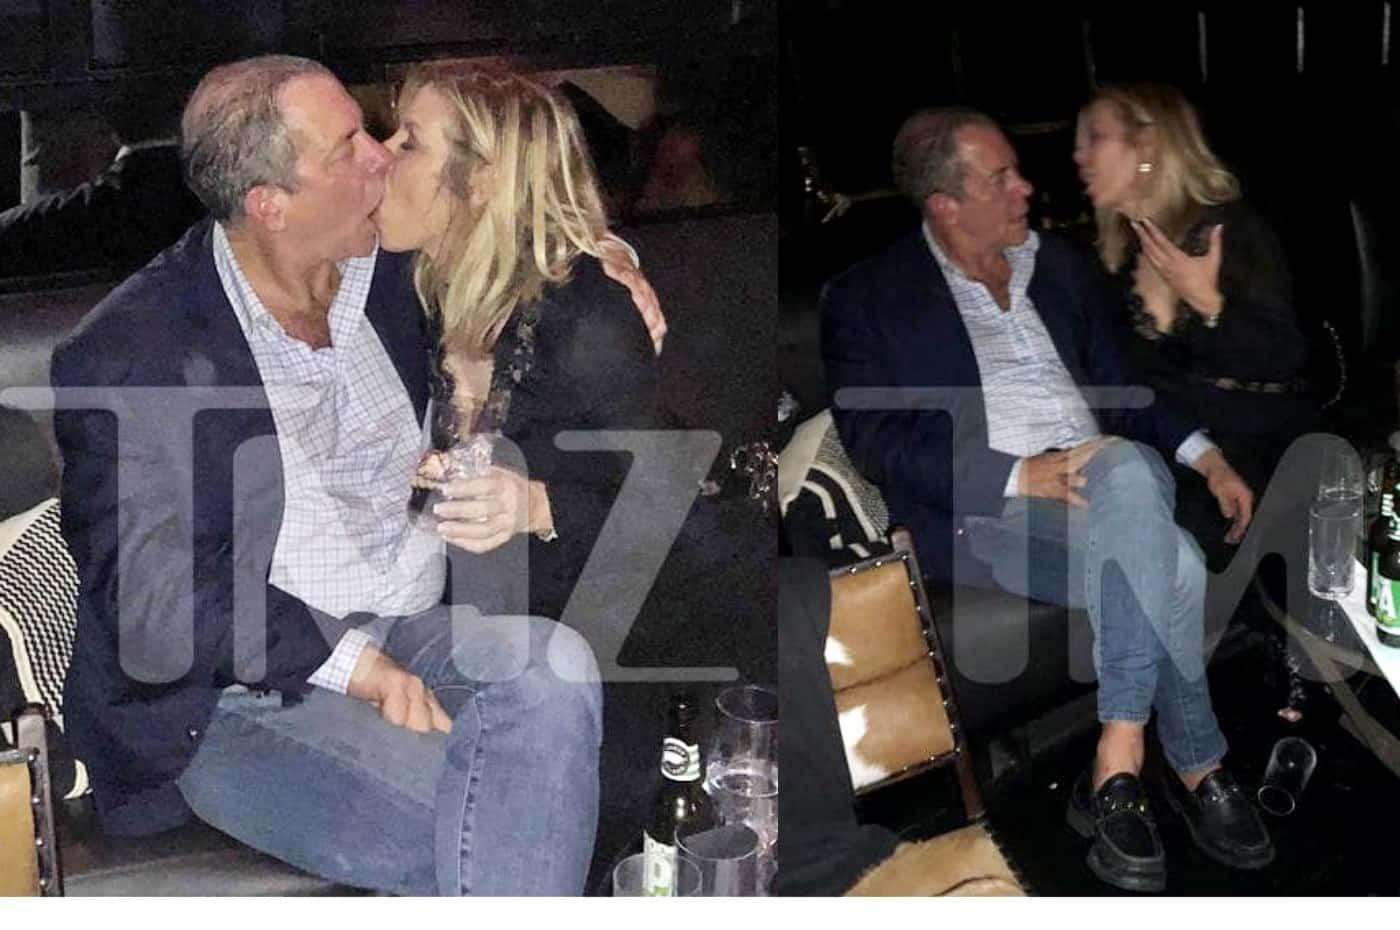 RHONY Ramona Singer kissing Harry Dubin photos